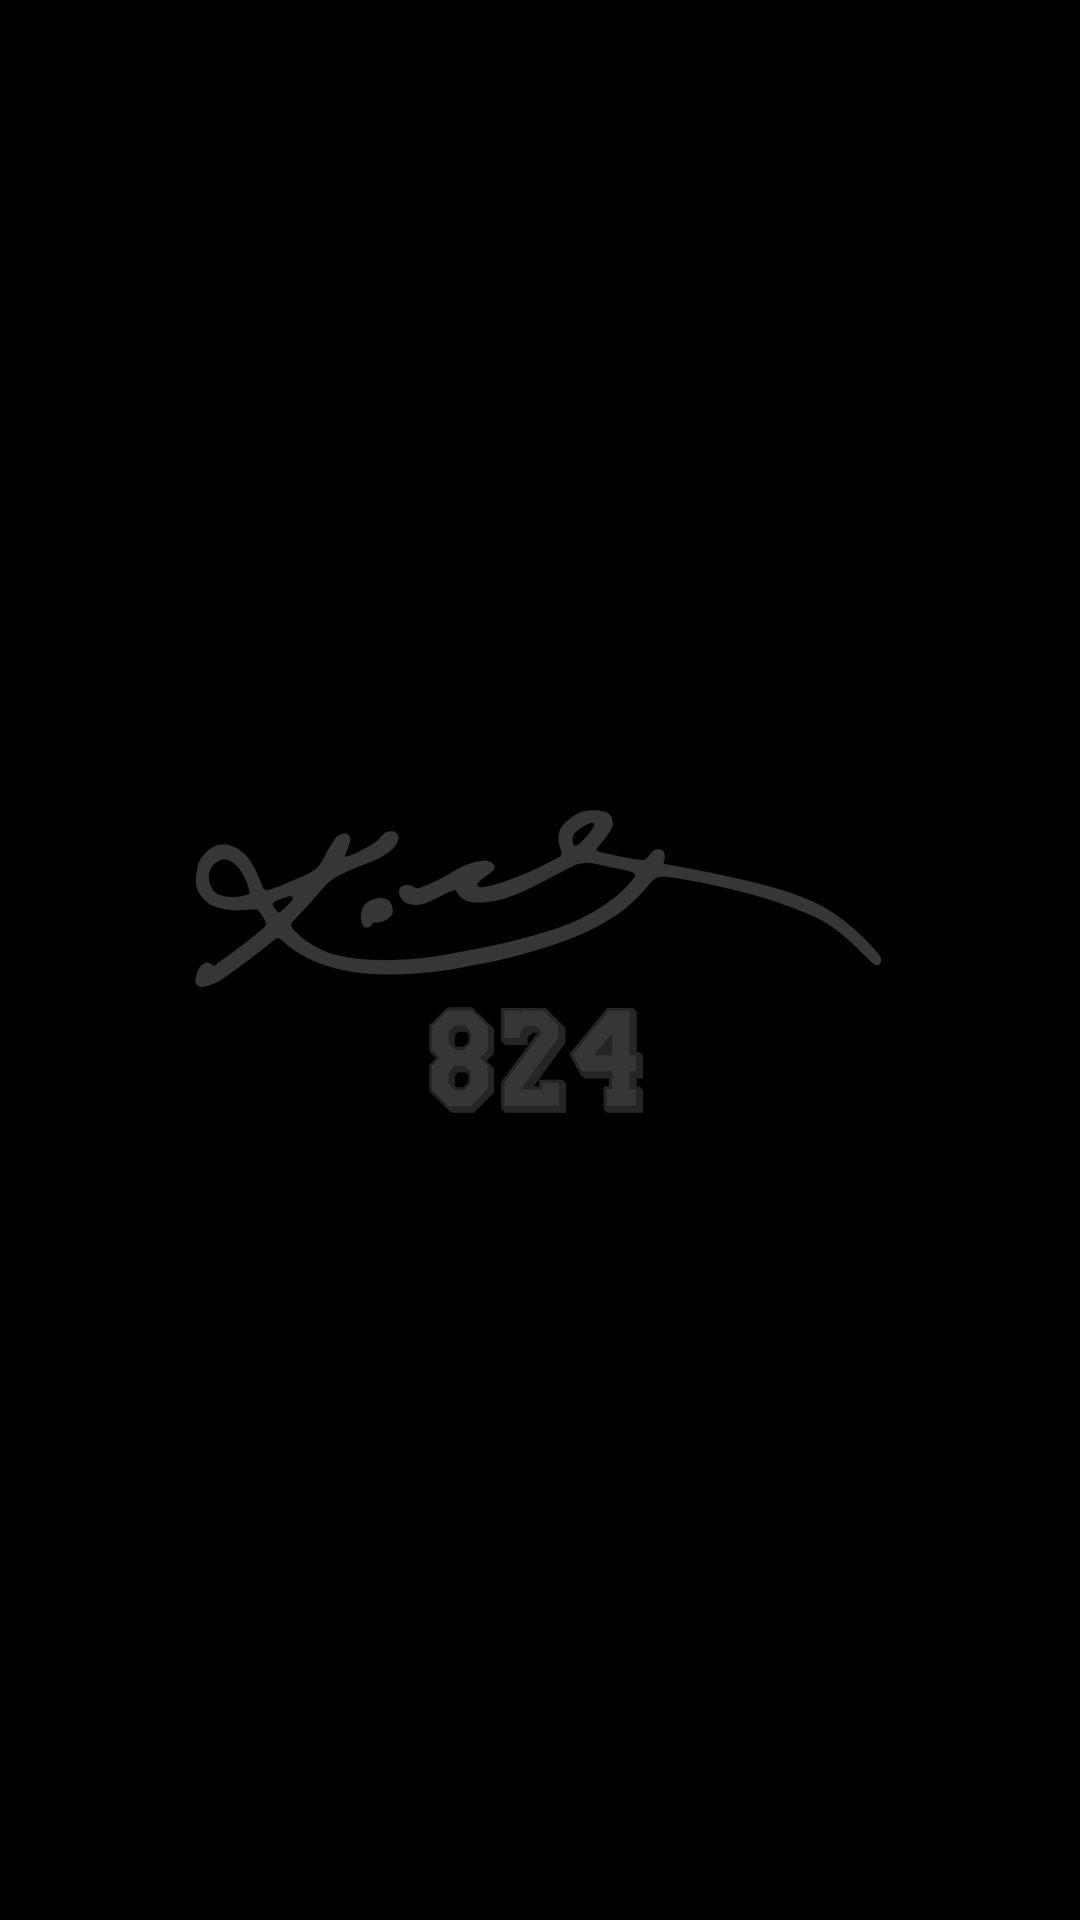 Kobe 824 Rip In 2020 Kobe Bryant Wallpaper Black Mamba Iphone Black